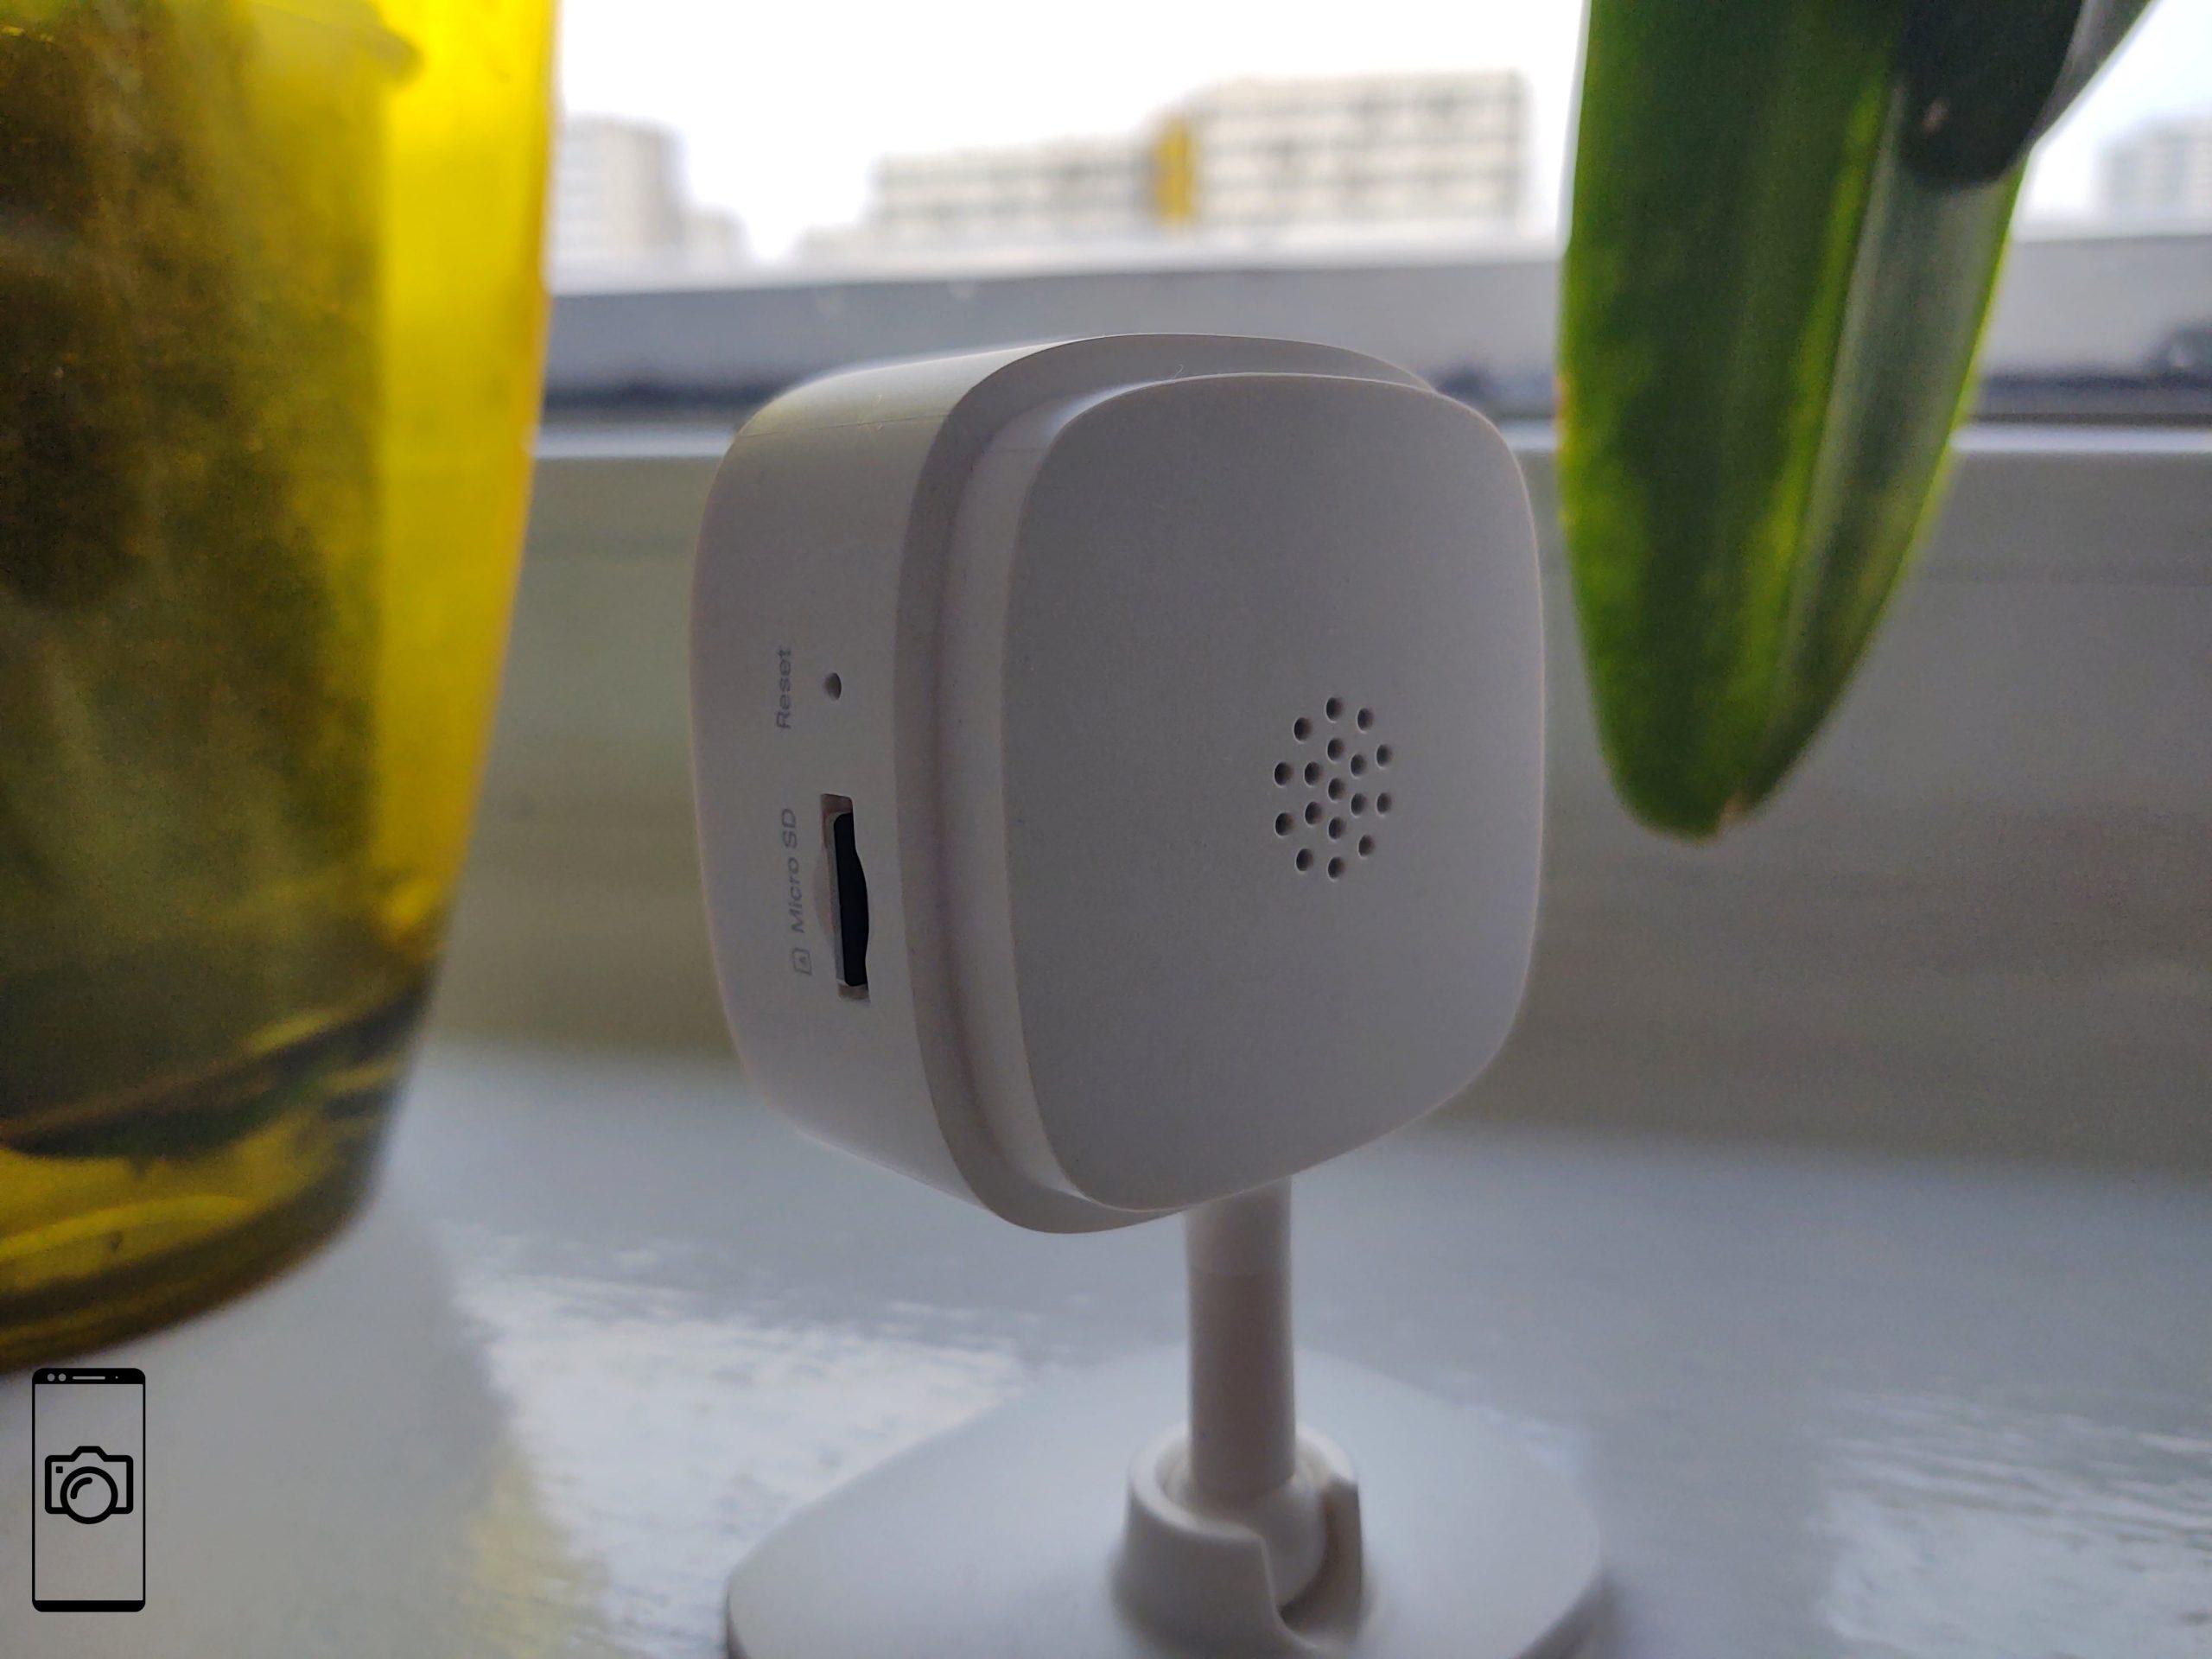 TP-Link Kasa Smart Tapo C100